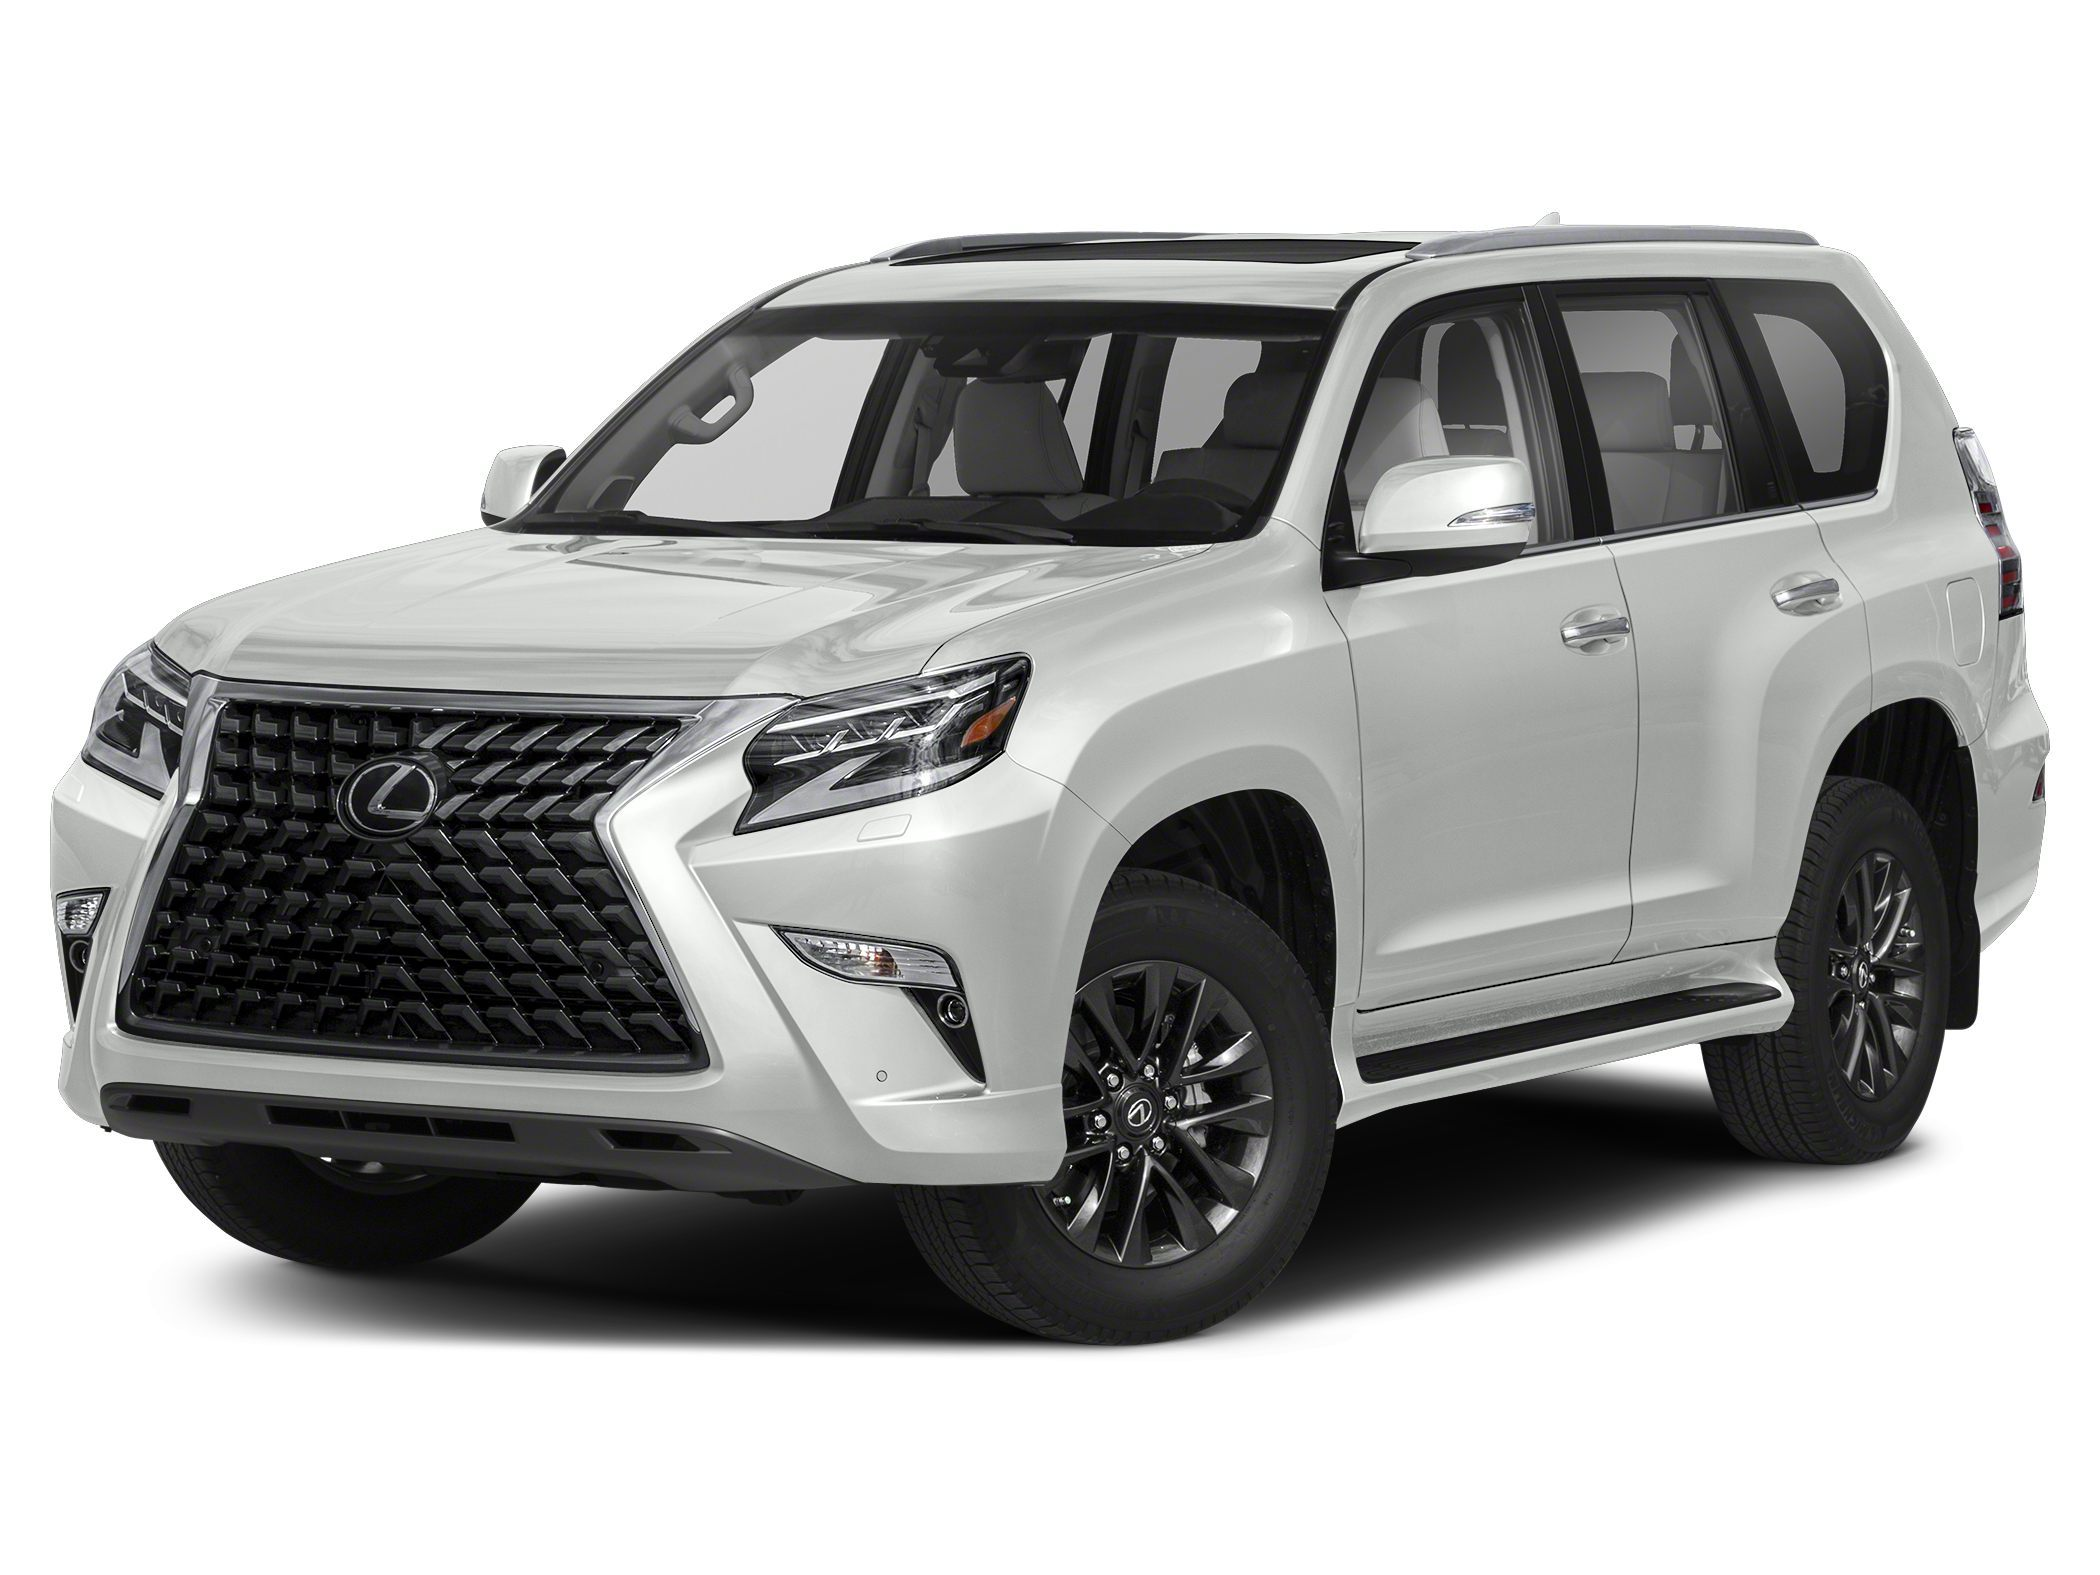 2020 LEXUS GX Luxury SUV